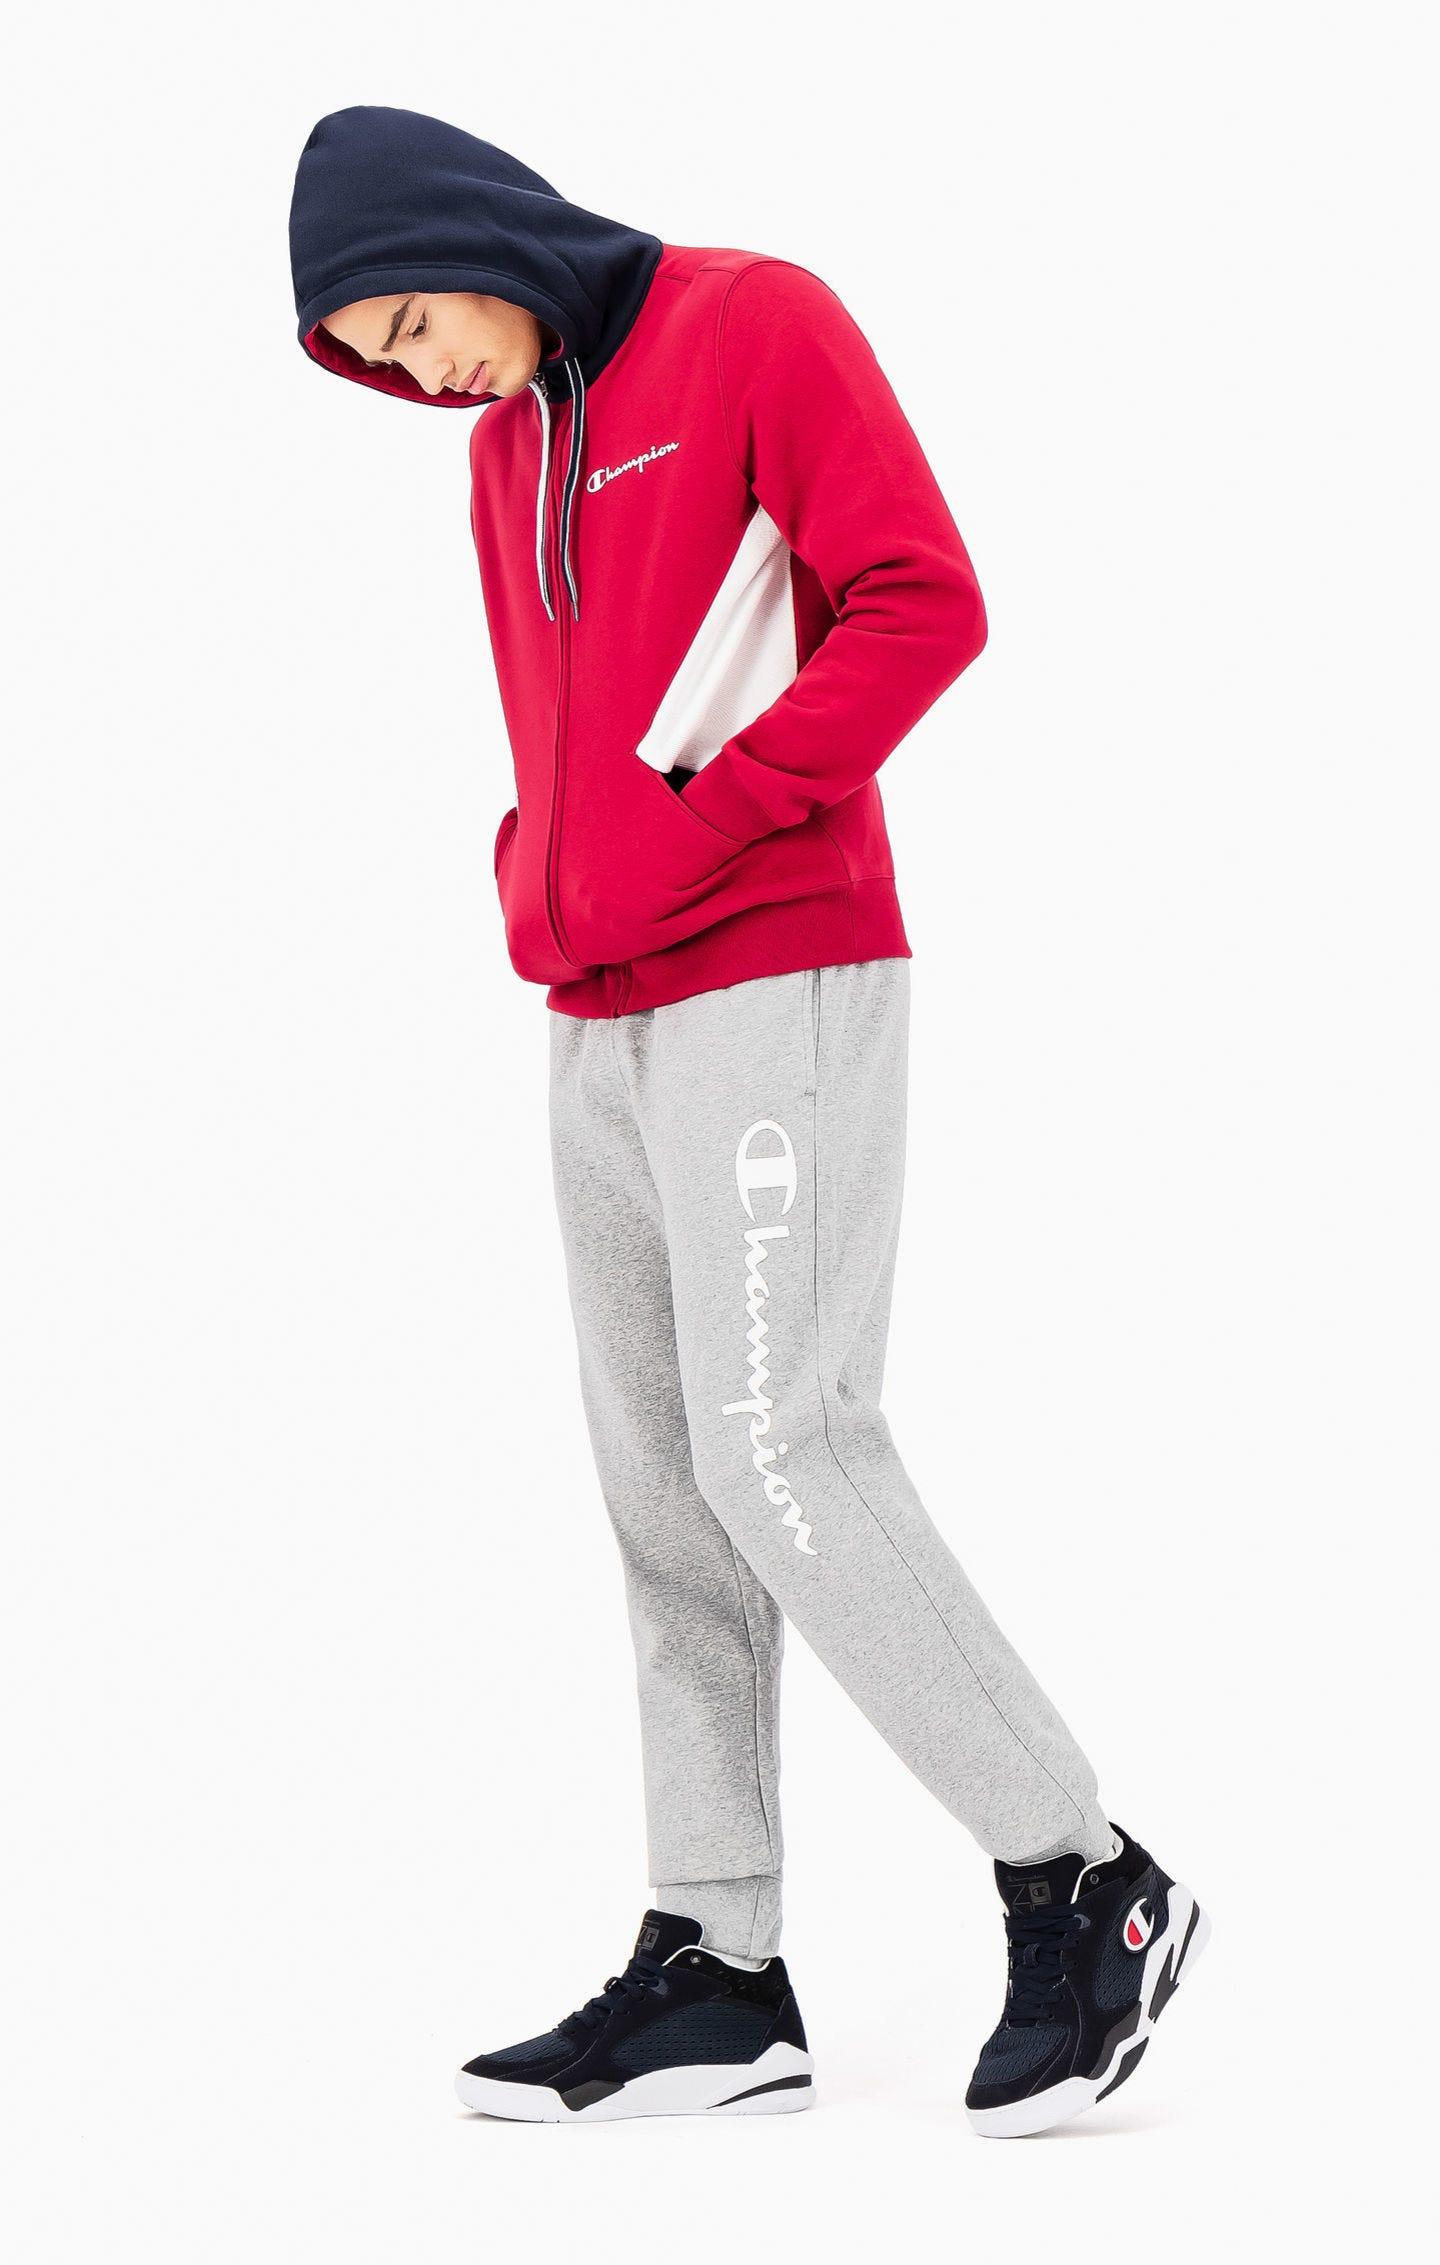 Champion Jogginghose aus recyceltem Baumwollfrottee mit Printlogo grau